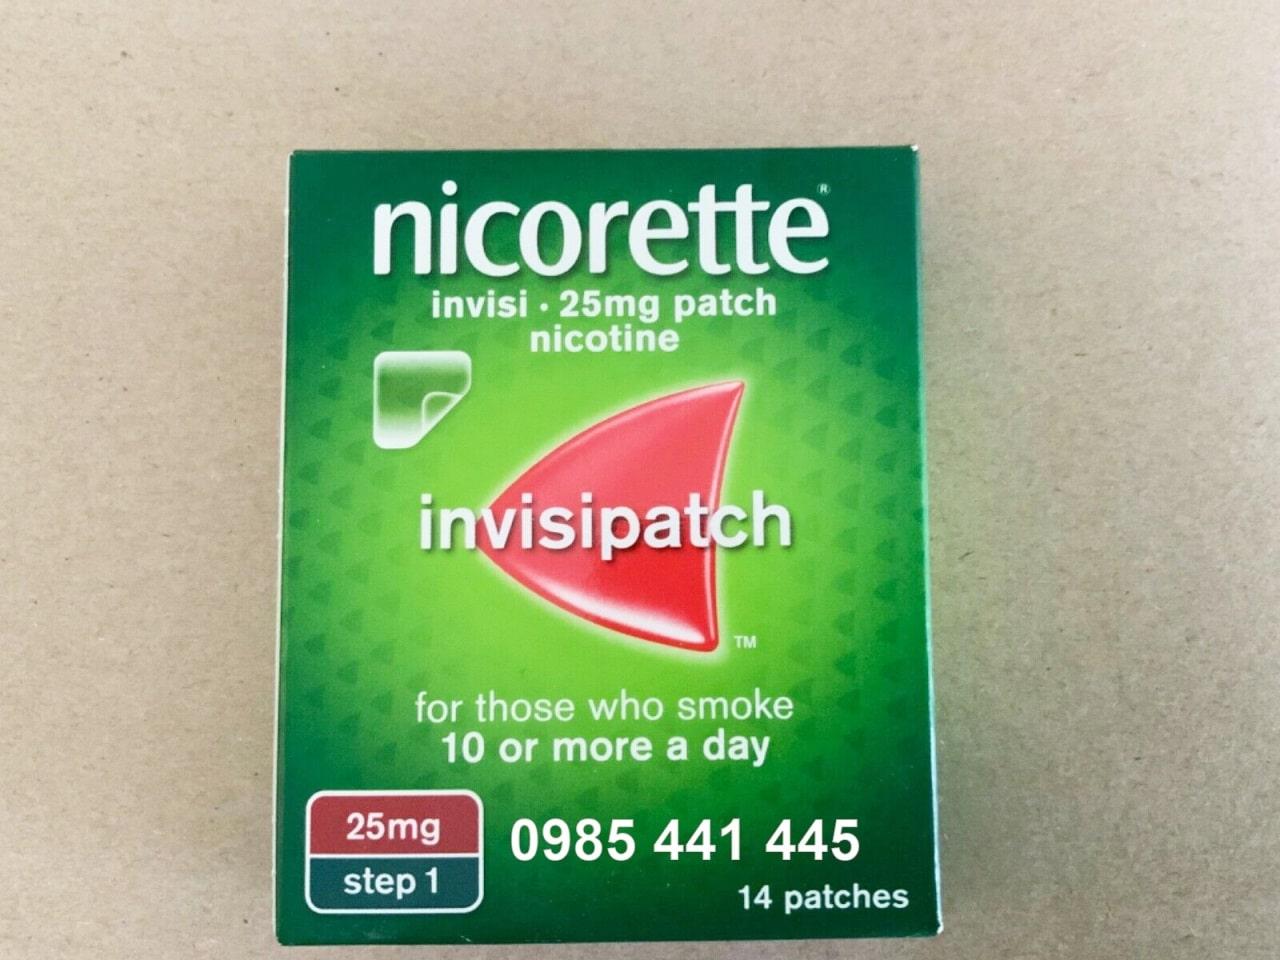 MIếng dán cai thuốc lá Nicorette